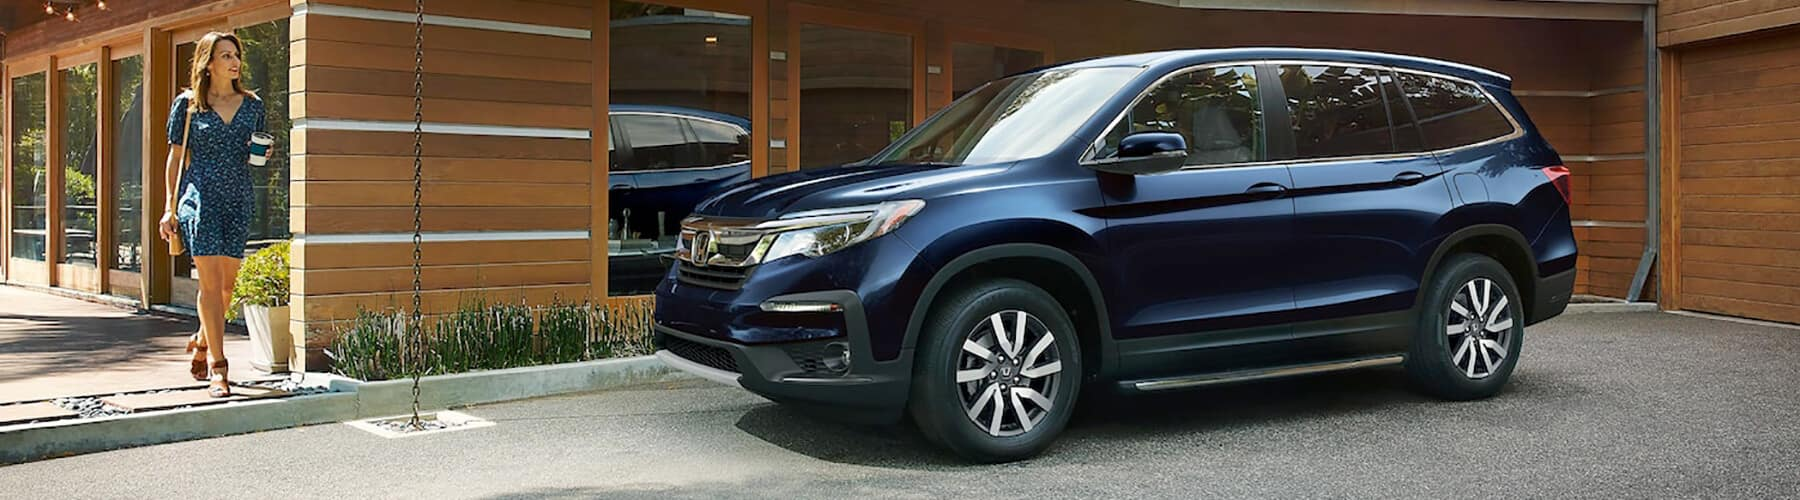 Honda Dealers Illinois >> 2020 Honda Pilot Midsize Family Suv In Illinois North